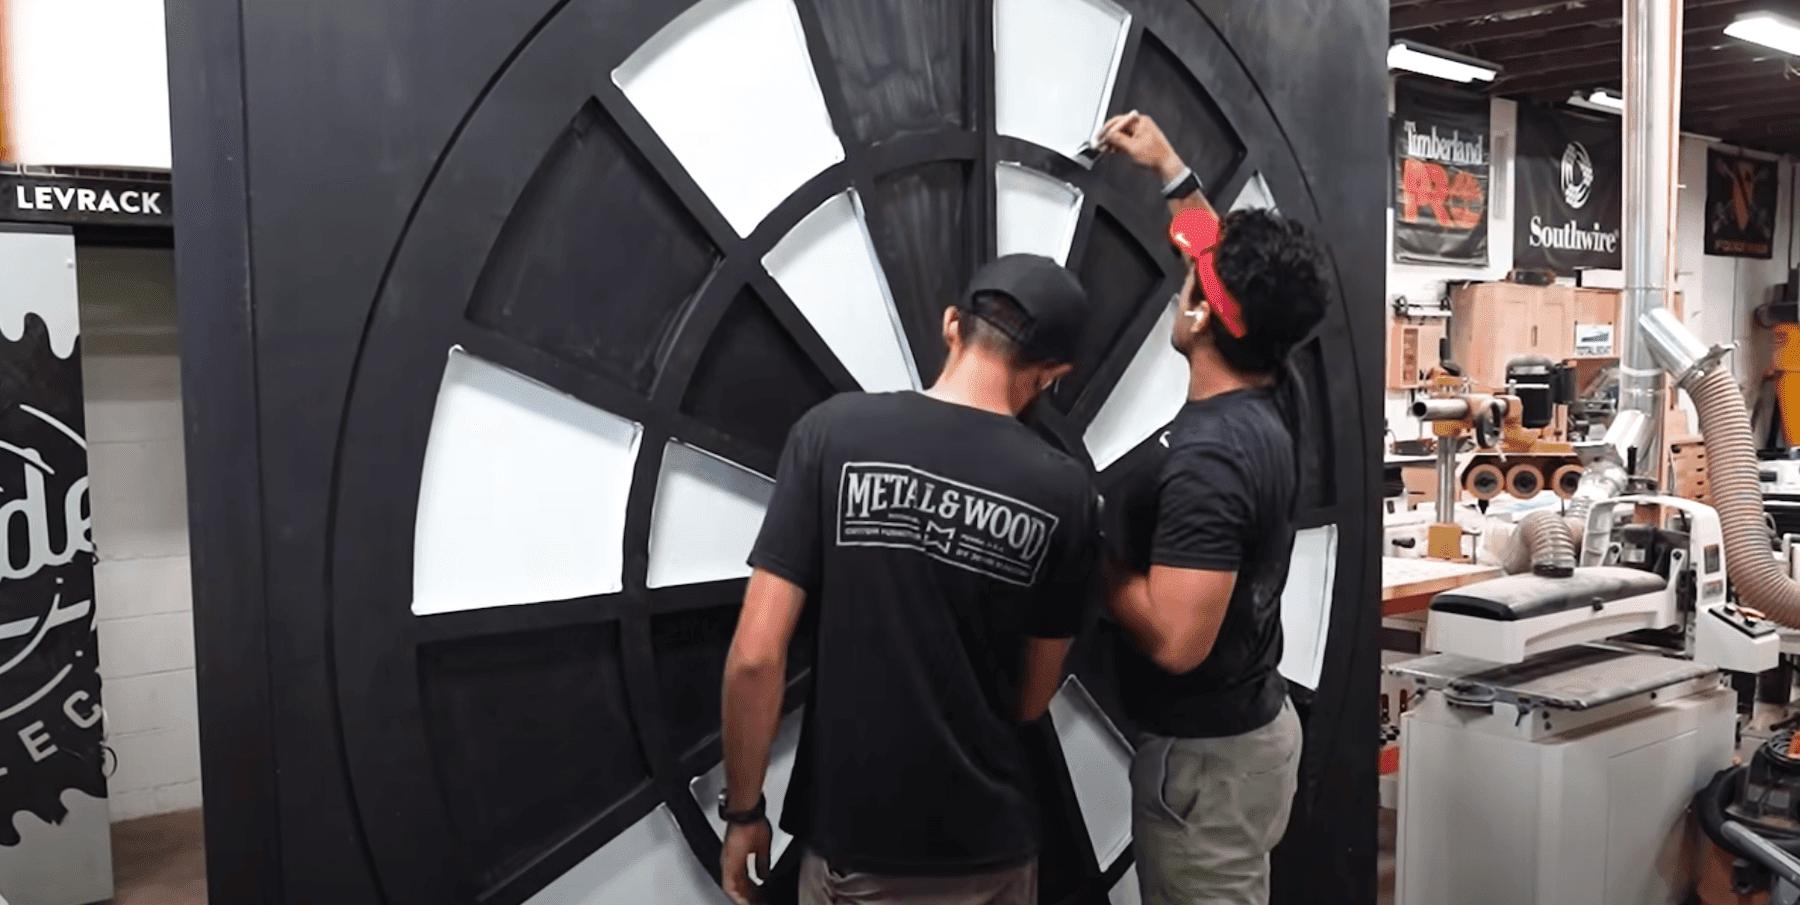 Sam and Jordan building massive dartboard